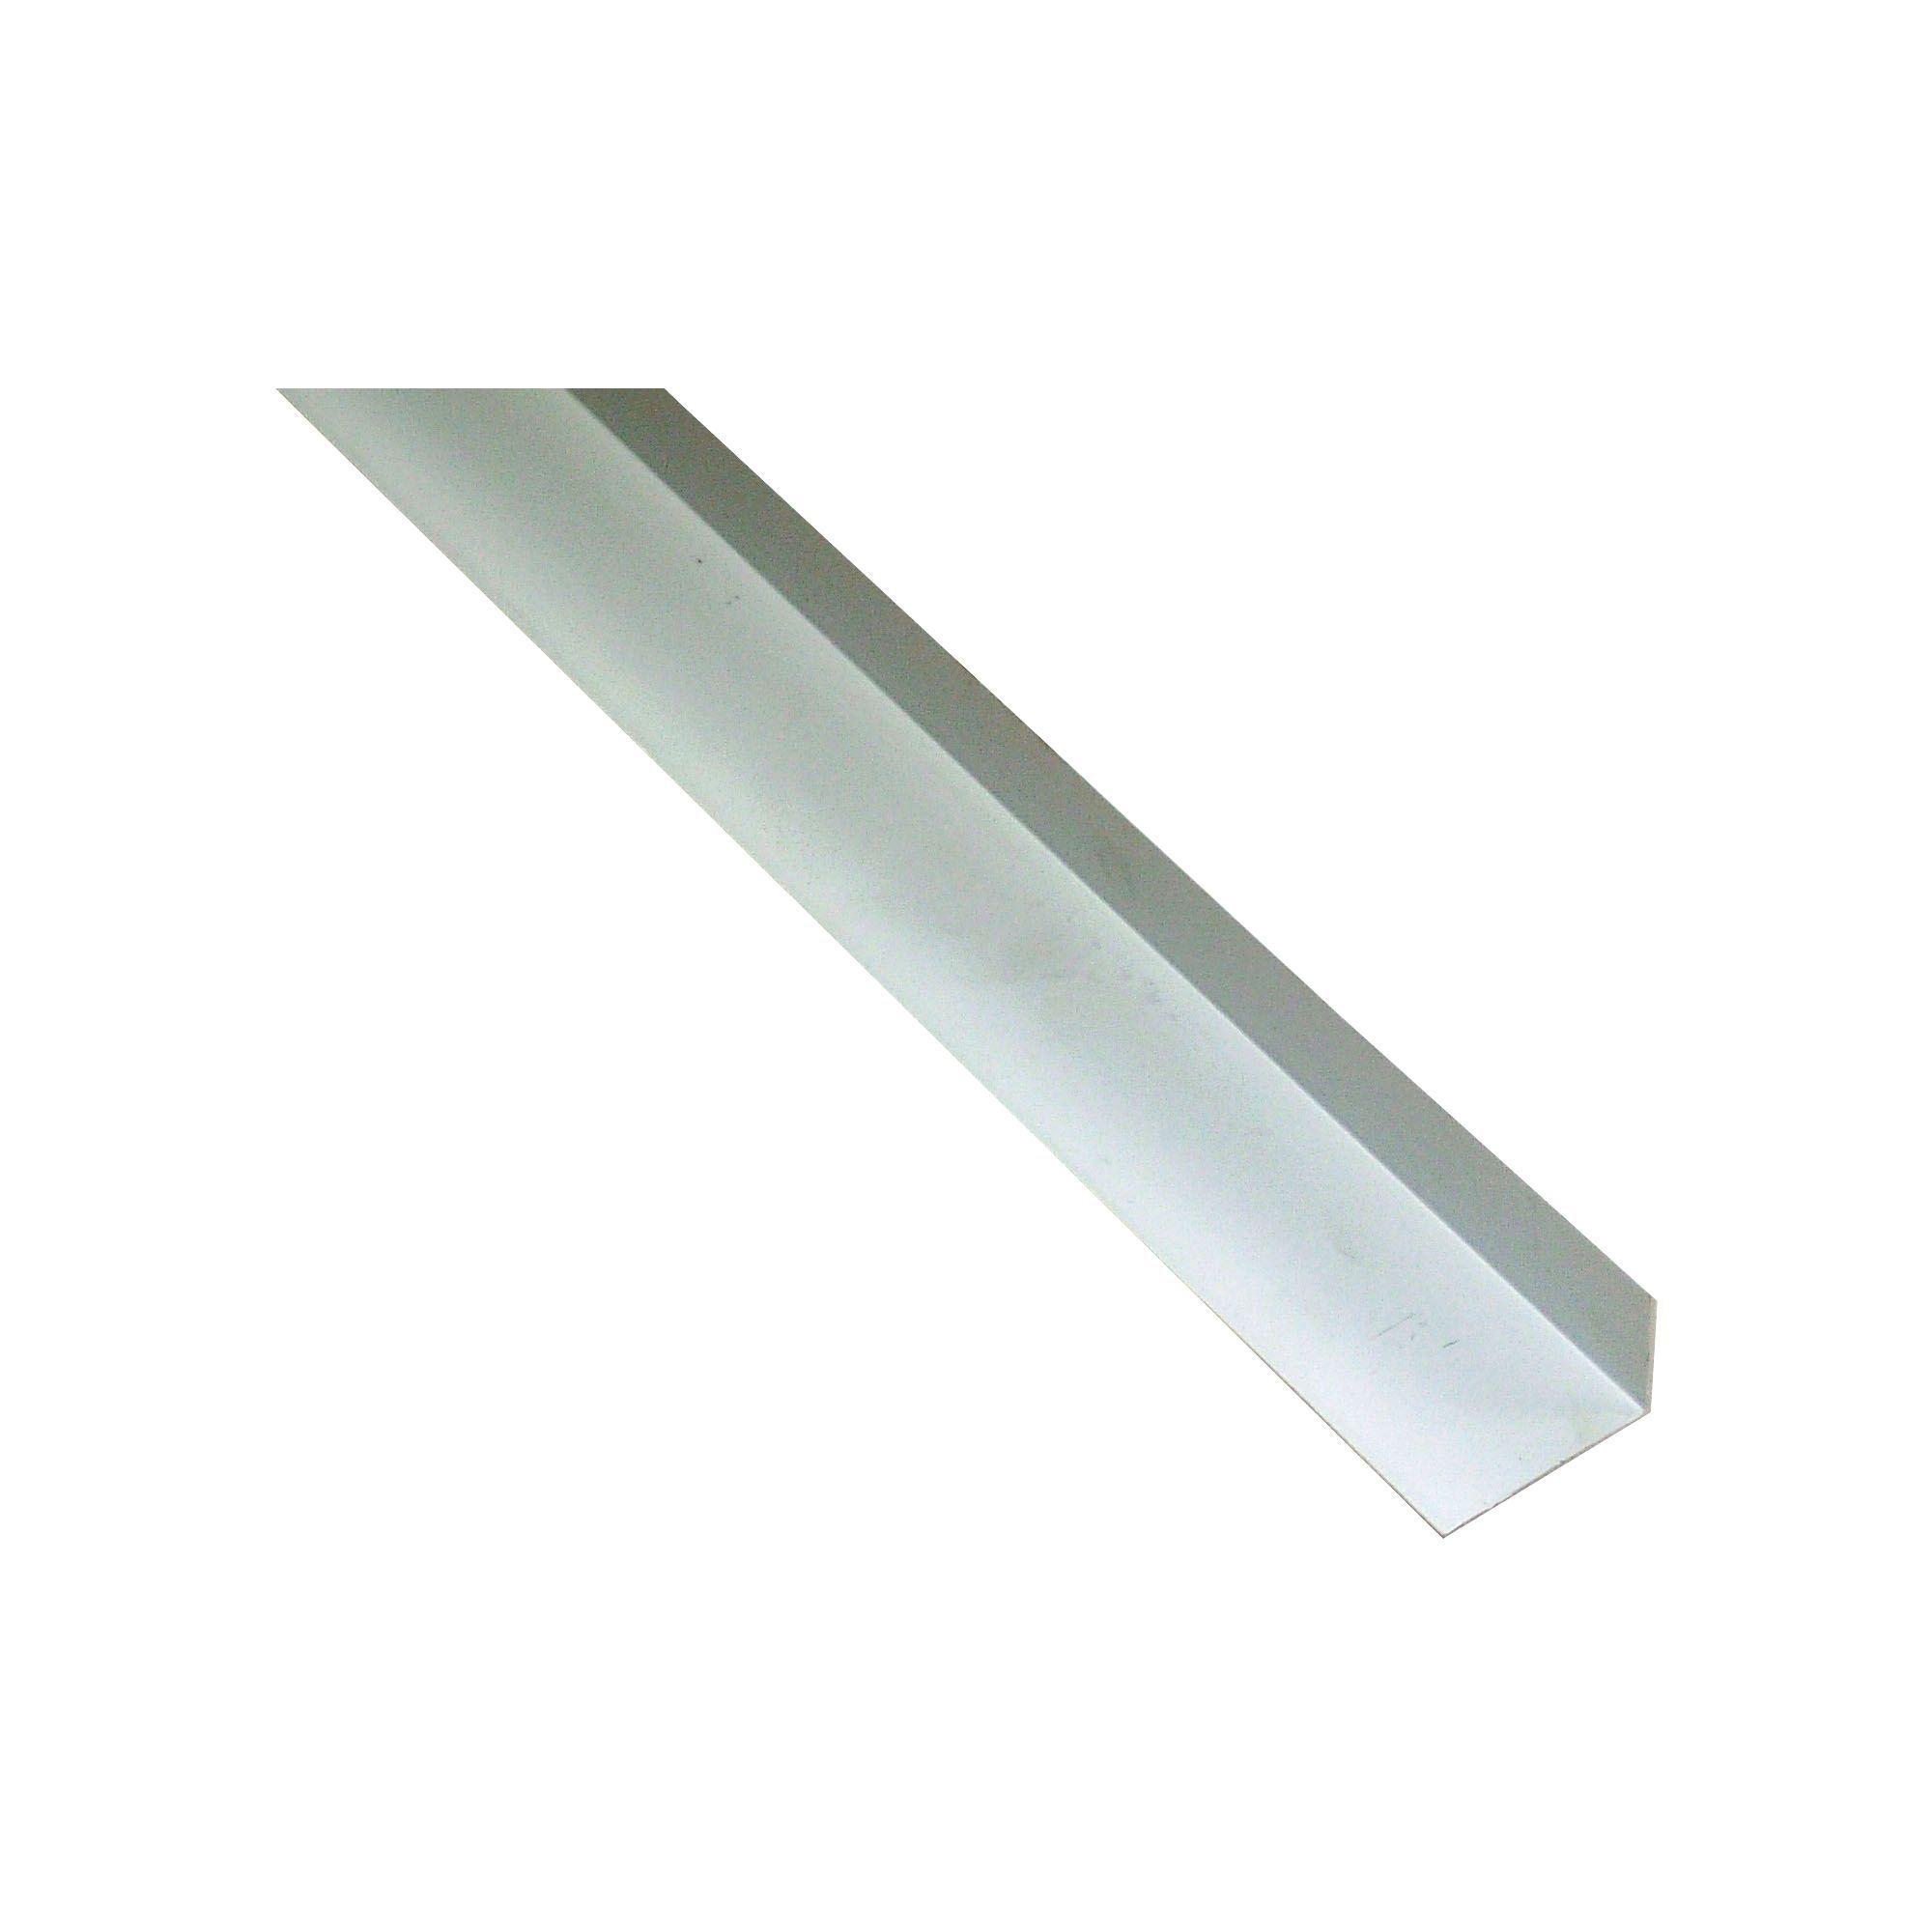 White Pvc Corner H 15mm W 25mm L 1m Departments Diy